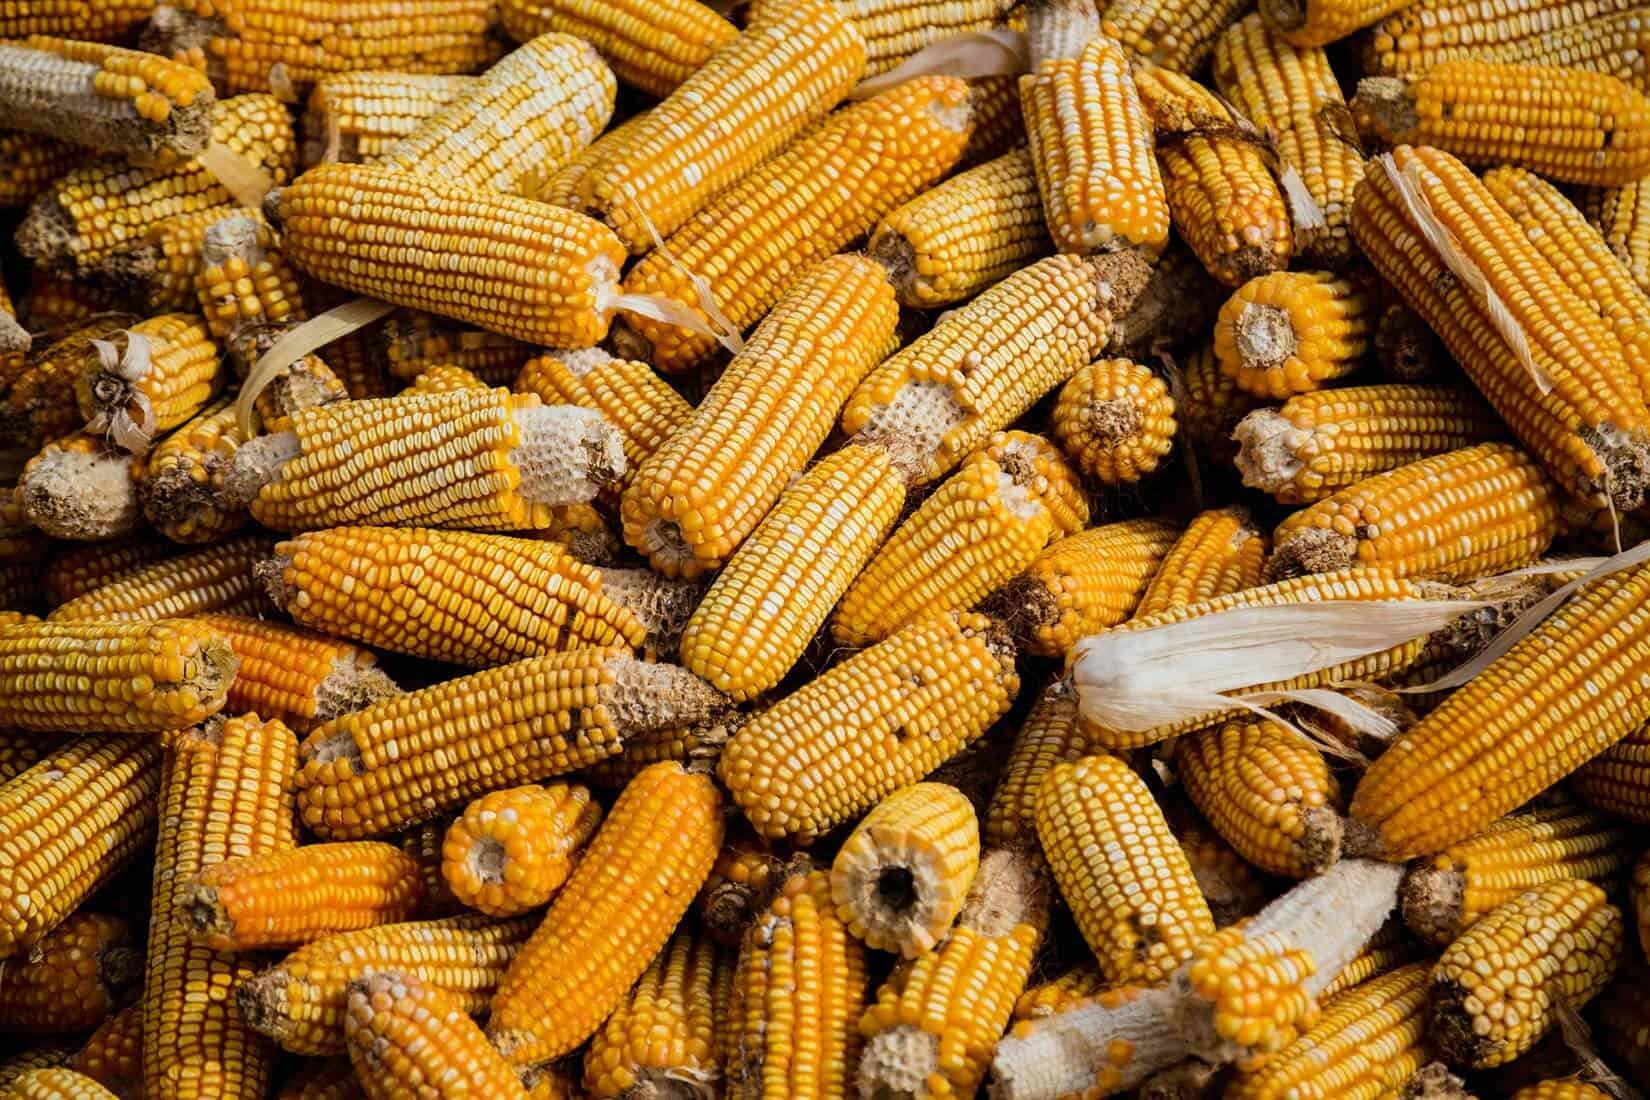 bunch of corn on the cob